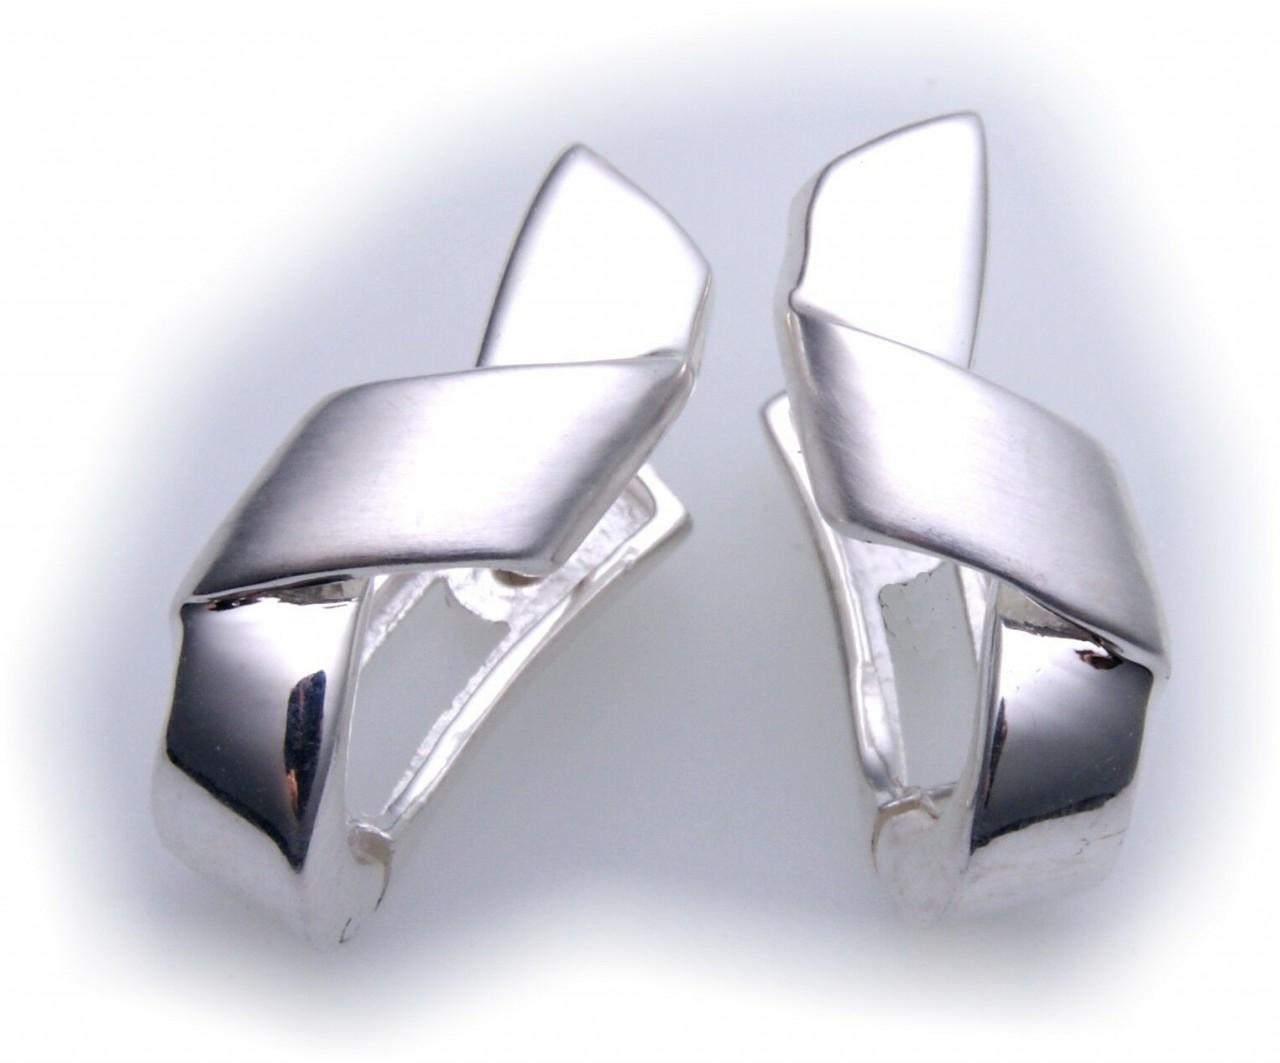 exkl. Ohrringe Creolen echt Silber 925 teilmatt Qualität Sterlingsilber Damen